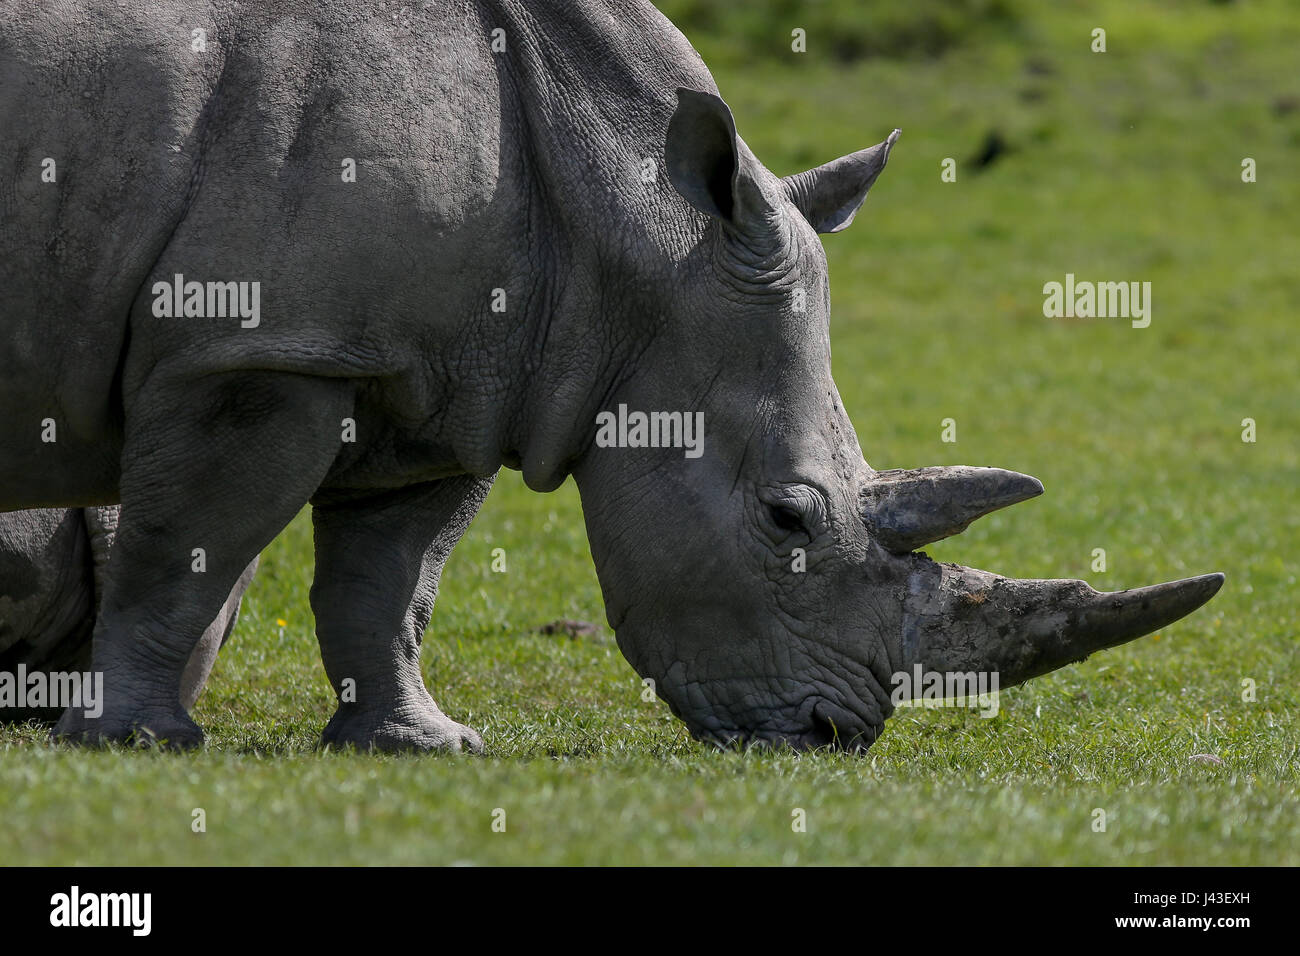 Rhino at Knowsley Safari, Prescot, United Kingdom - Stock Image